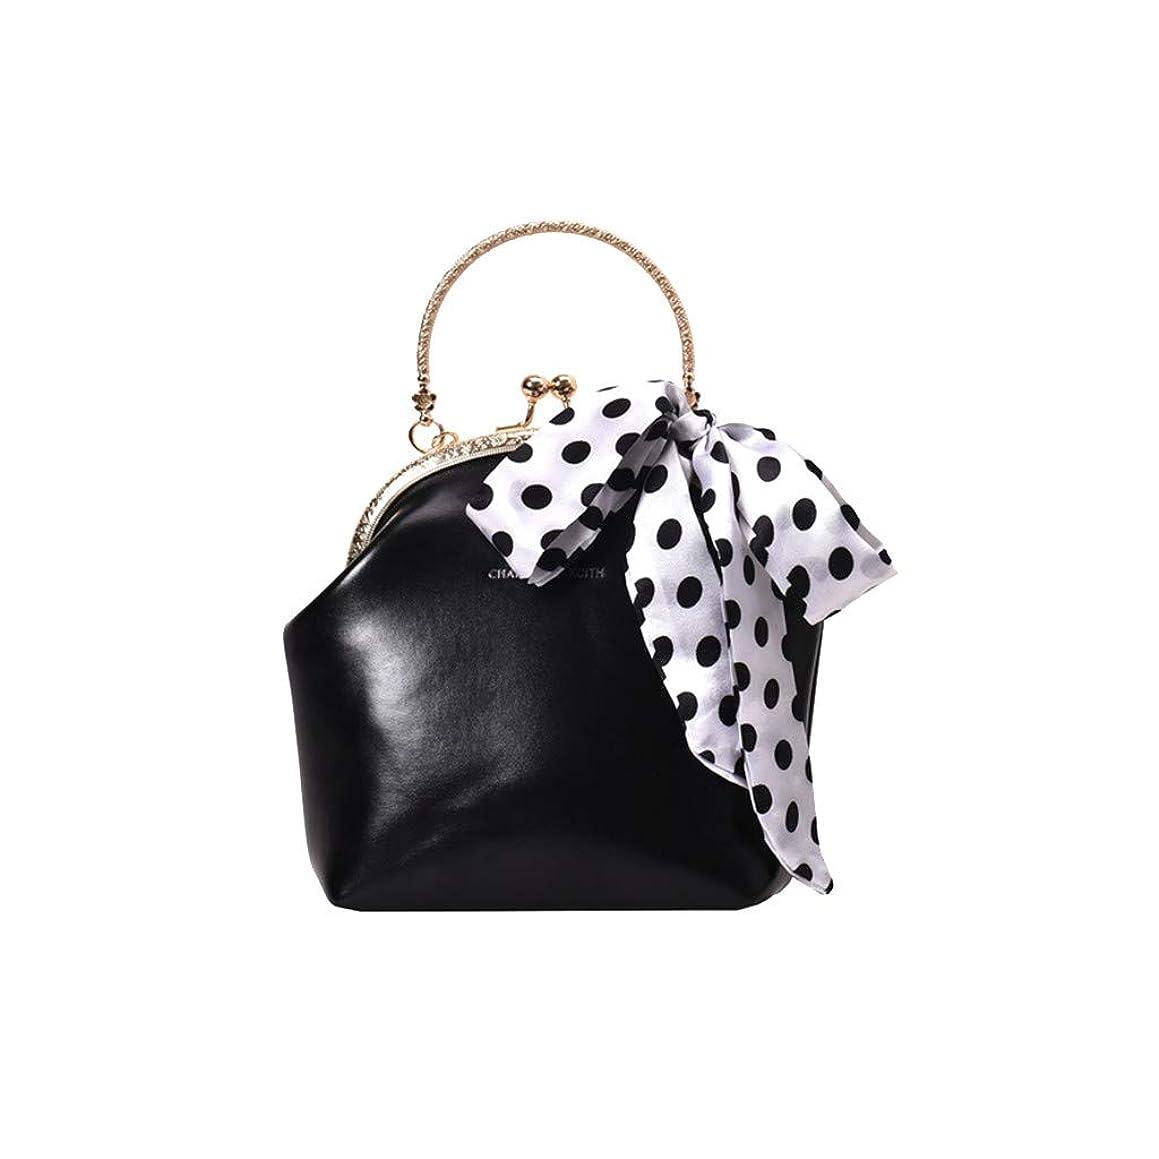 Crossbody Purses for Women Small Fashion Women Scarf Wild Messenger Bag Fashion One-Shoulder Small Bag